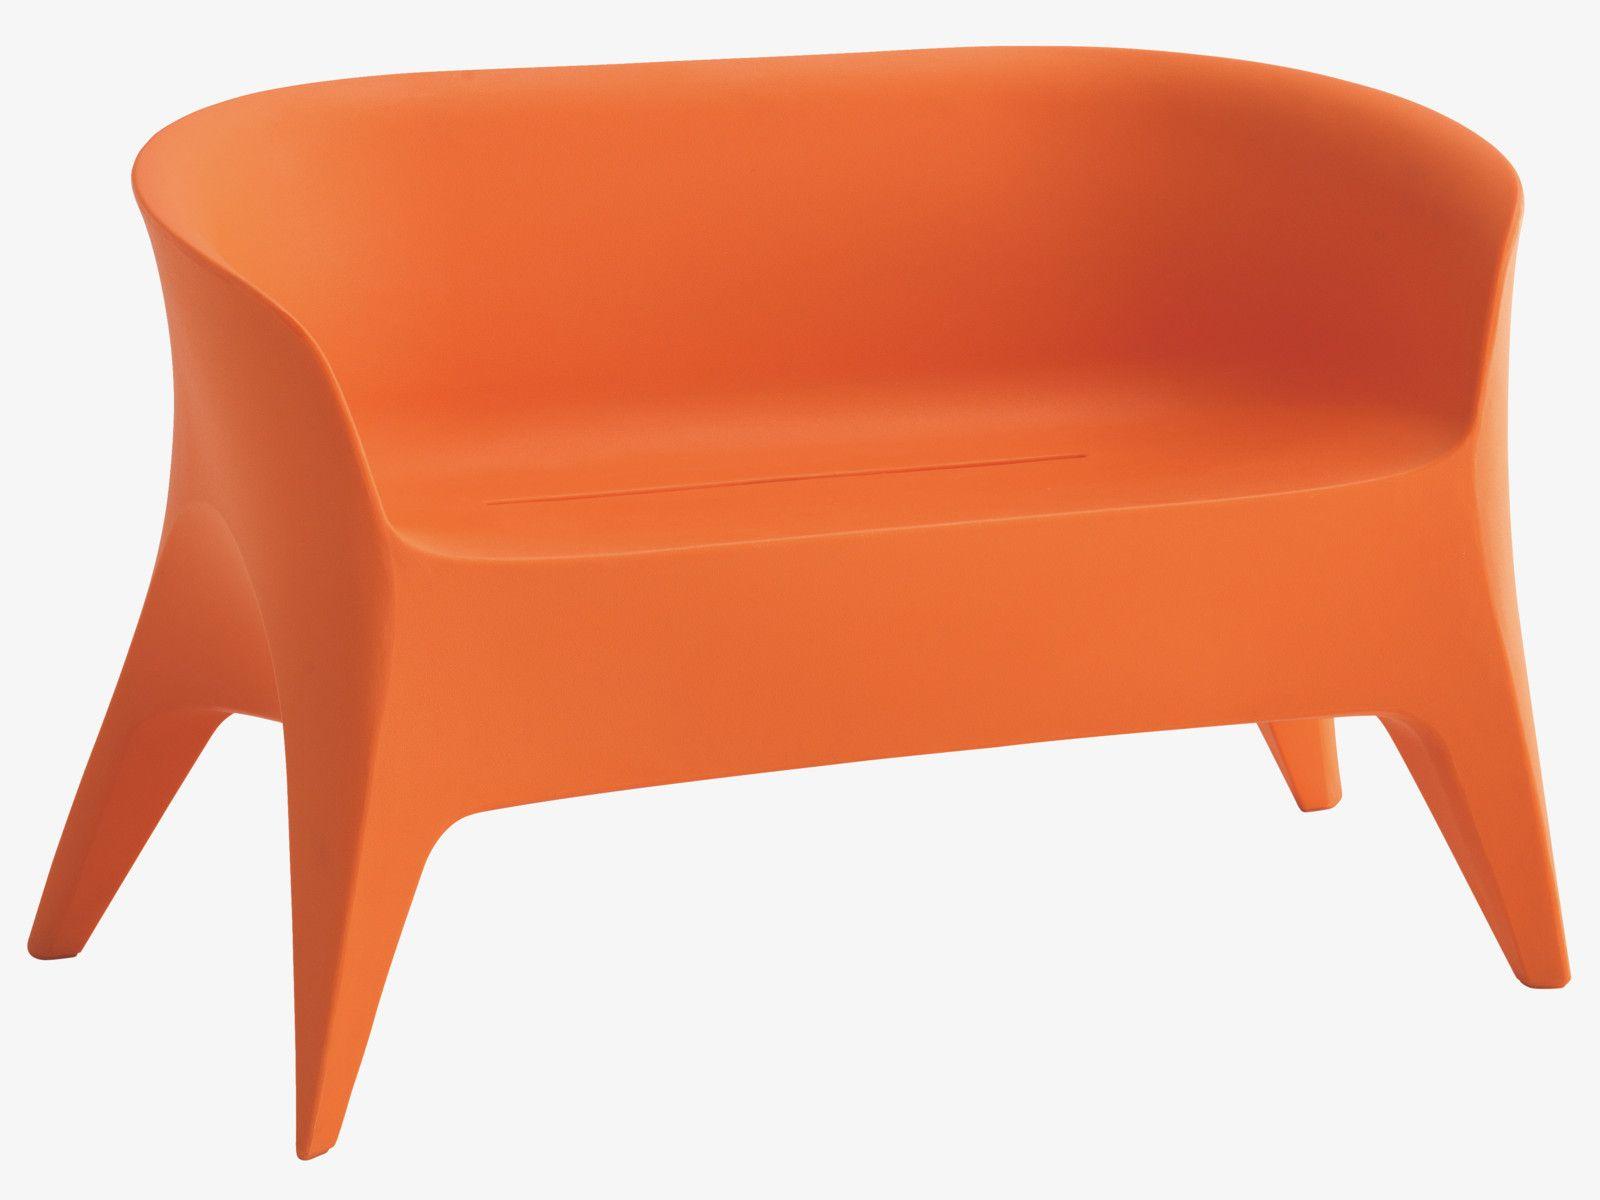 Excellent Minaji Orange Plastic Orange 2 Seater Garden Bench Ibusinesslaw Wood Chair Design Ideas Ibusinesslaworg